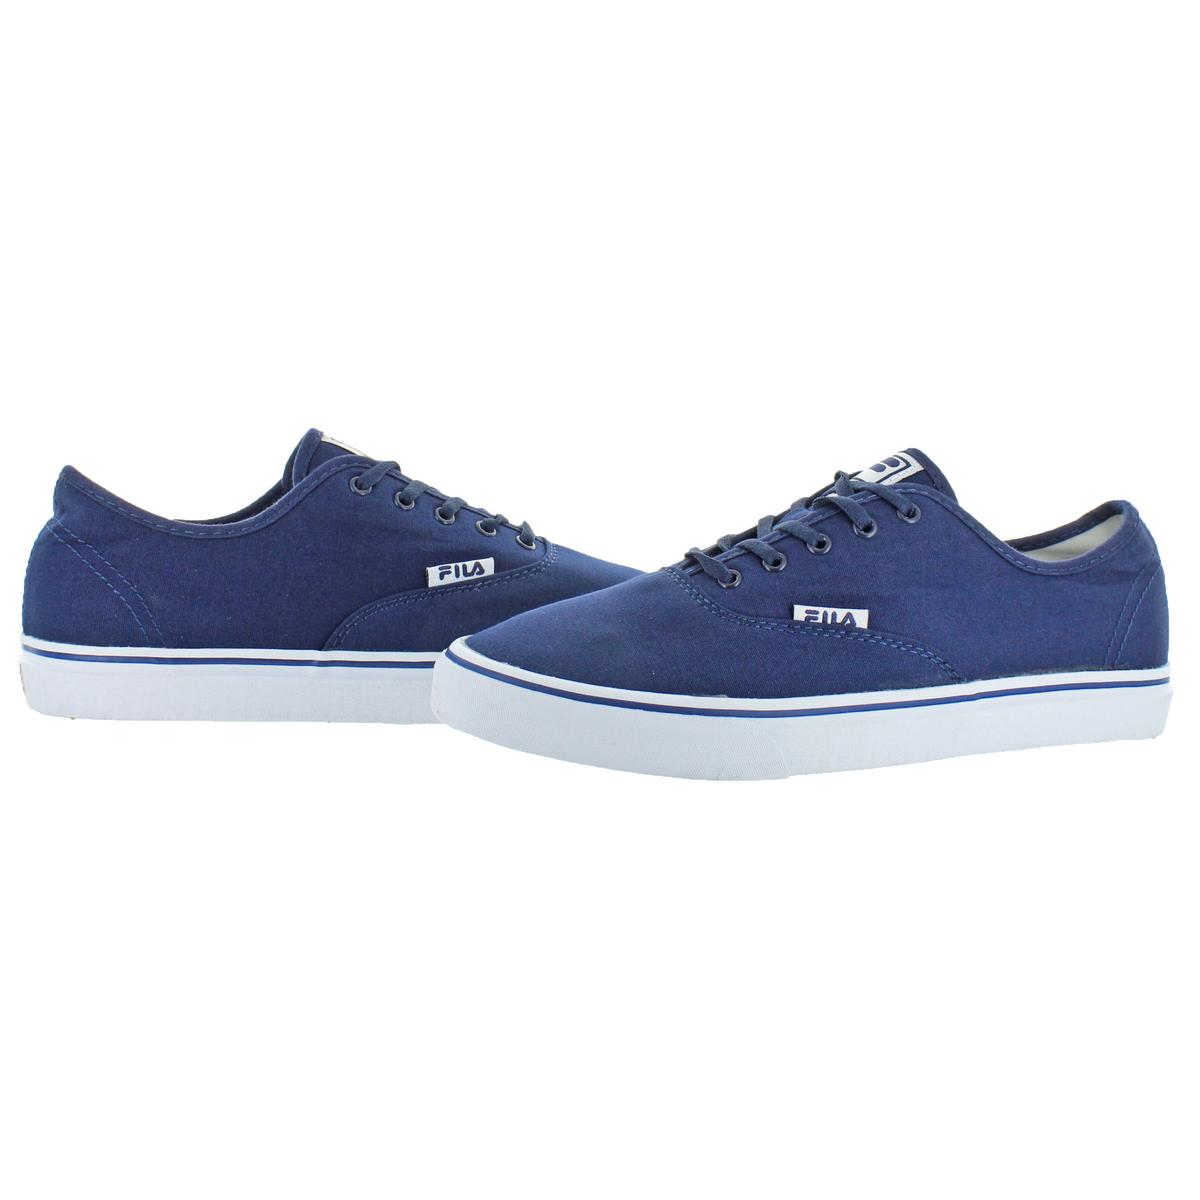 Fila-Classic-Canvas-Men-039-s-Fashion-Skate-Sneakers-Shoes thumbnail 9